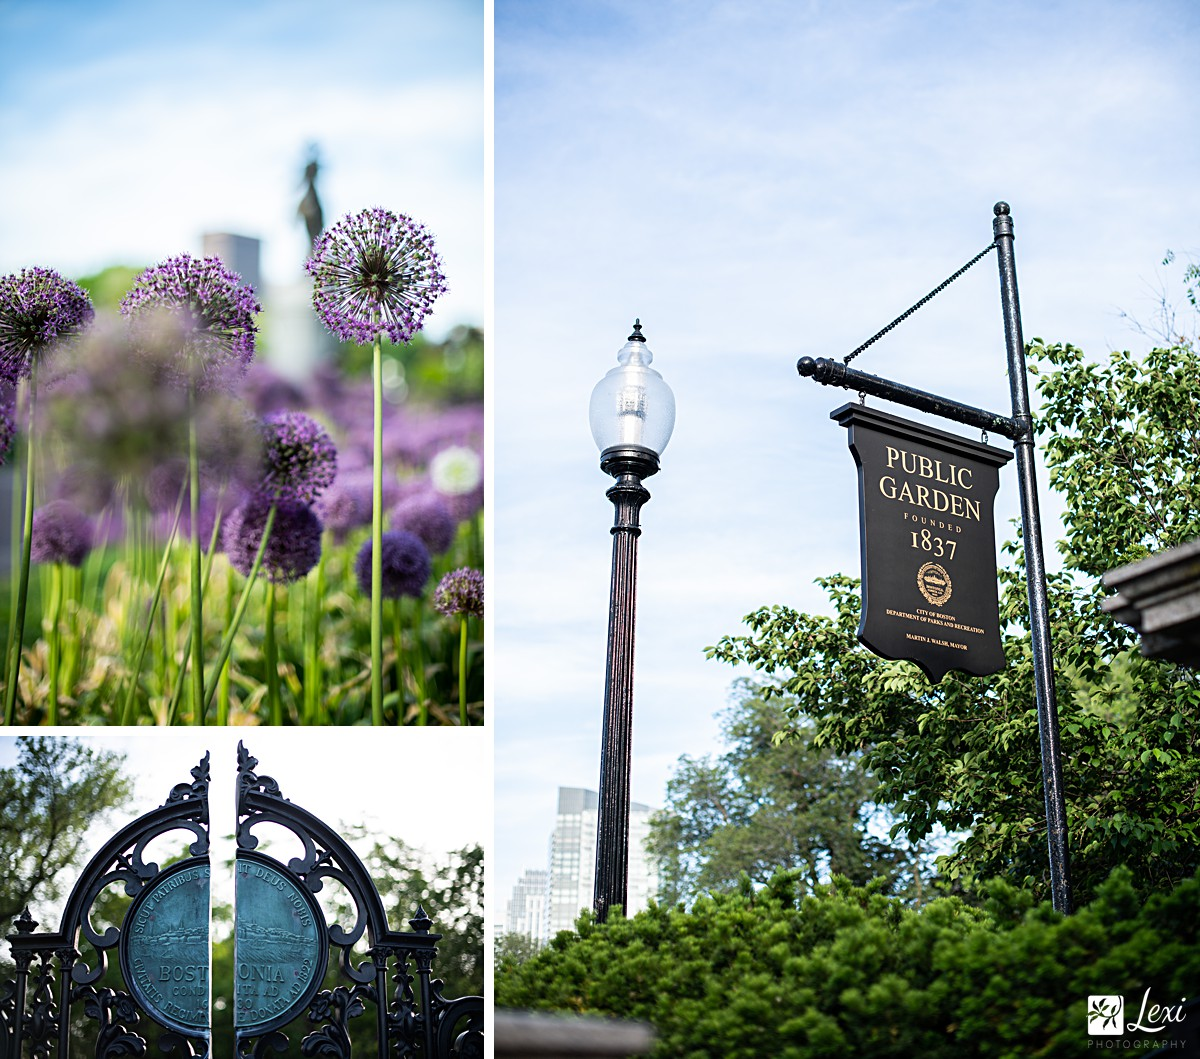 boston-public-garden-sign.jpg